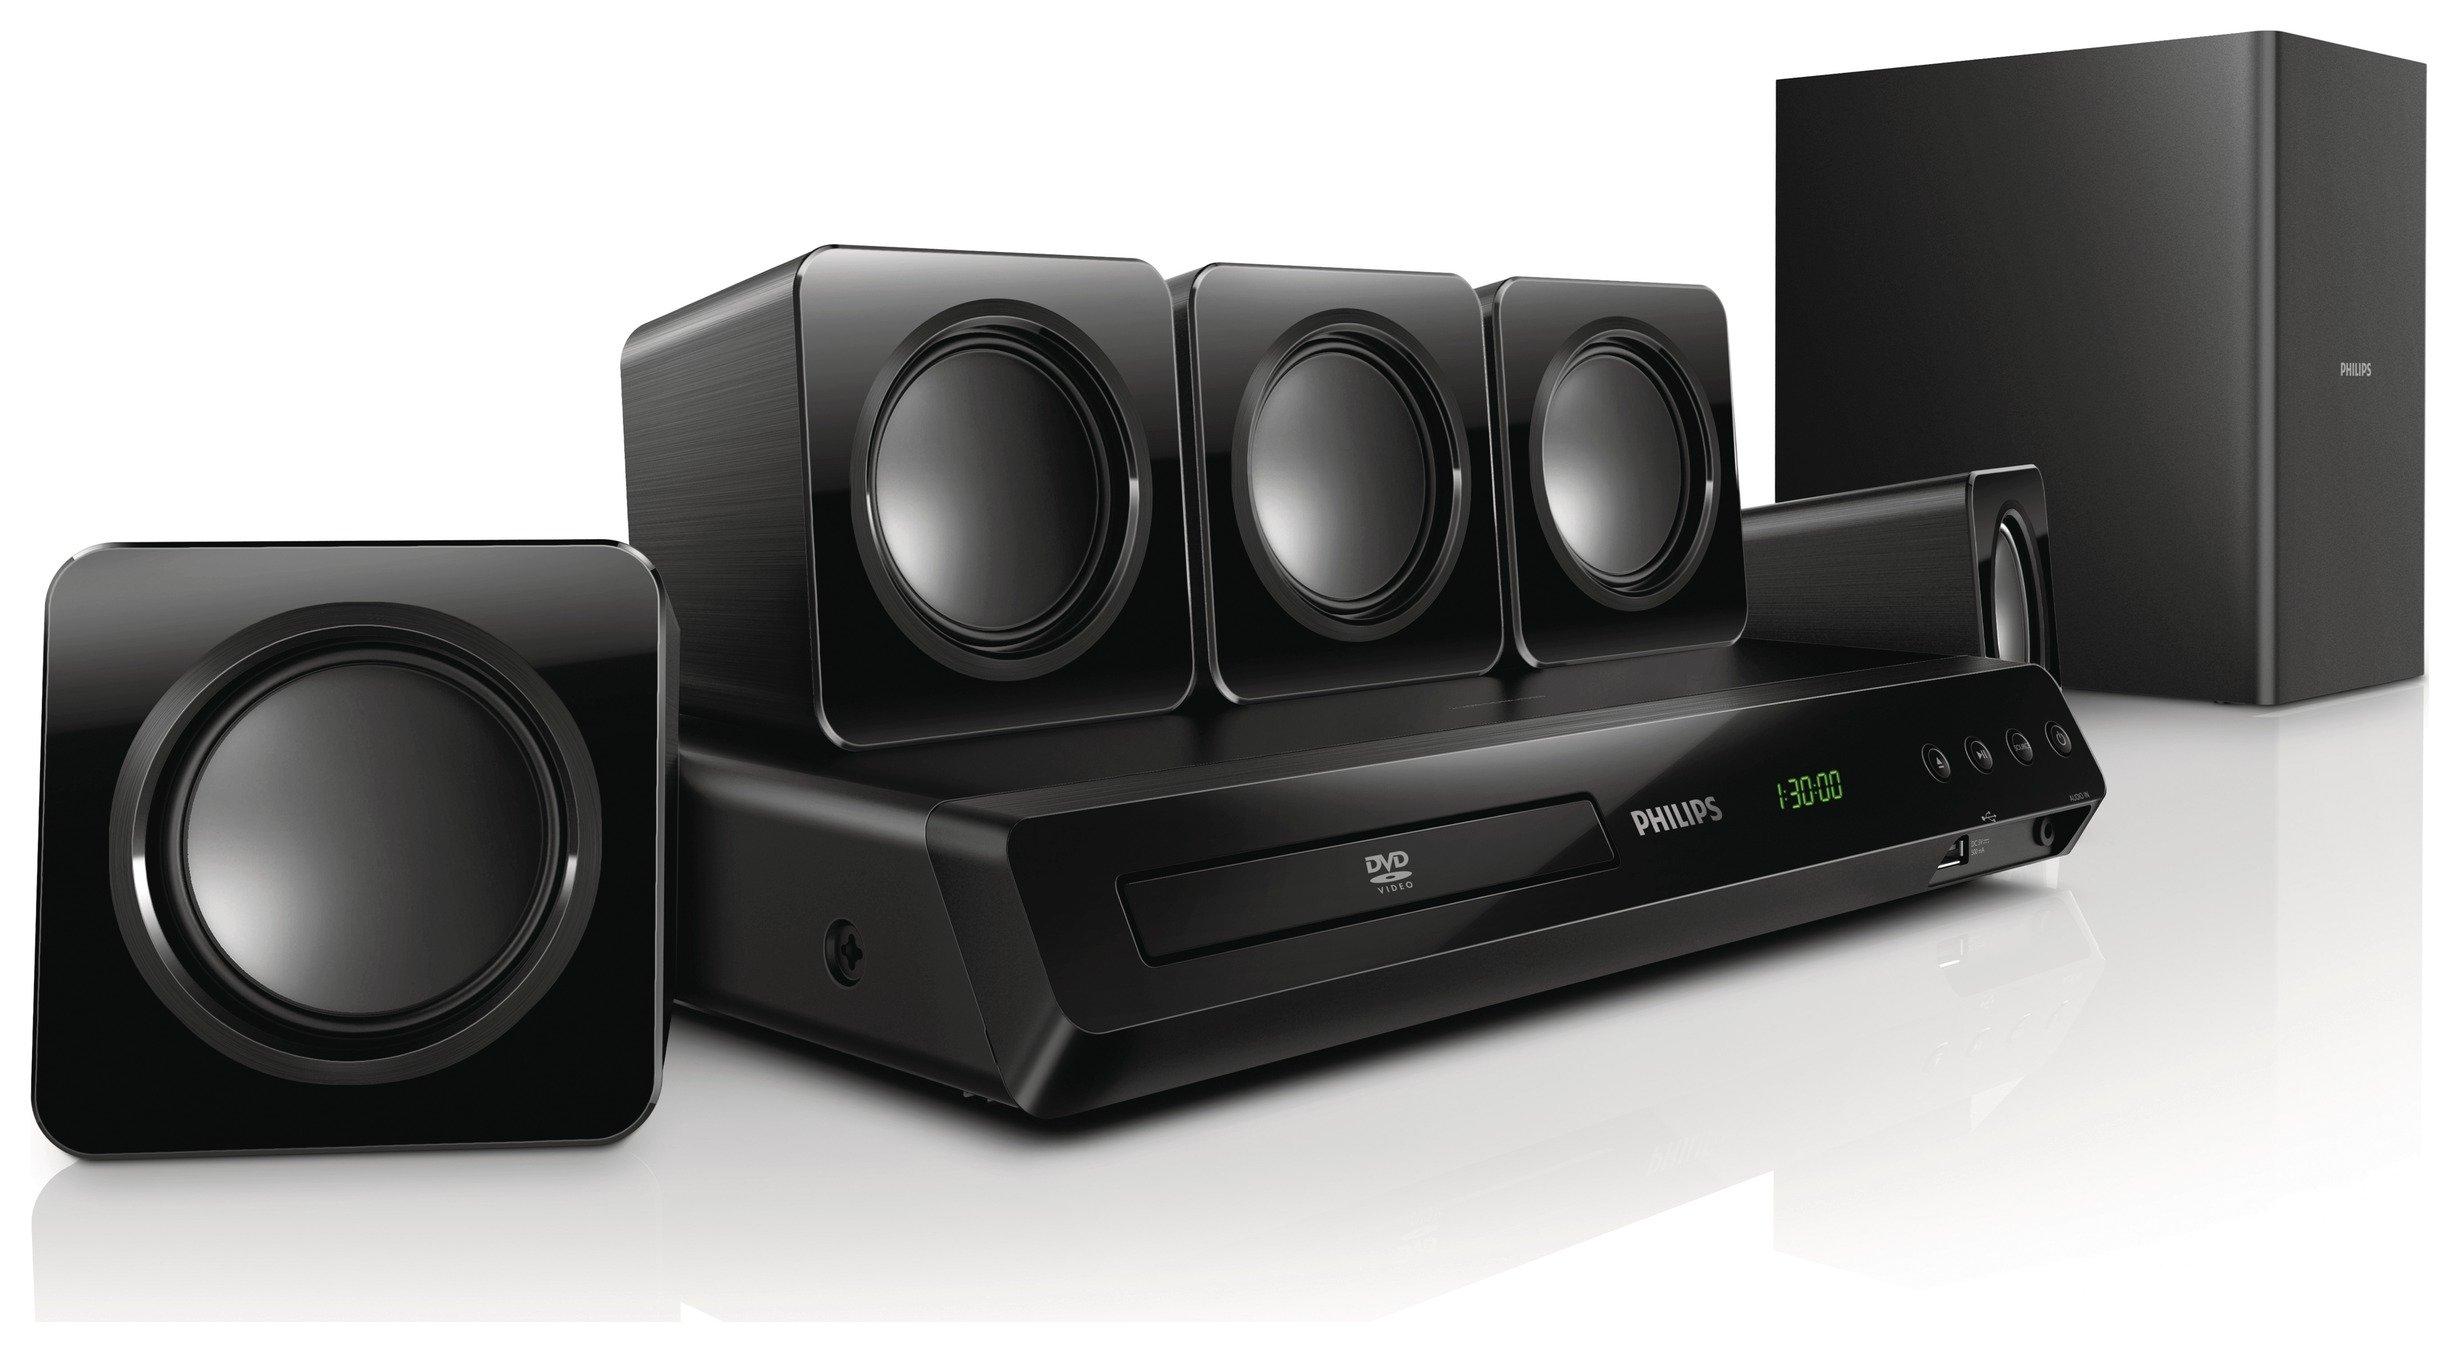 Philips - HTD3510/12 DVD Home Cinema System.